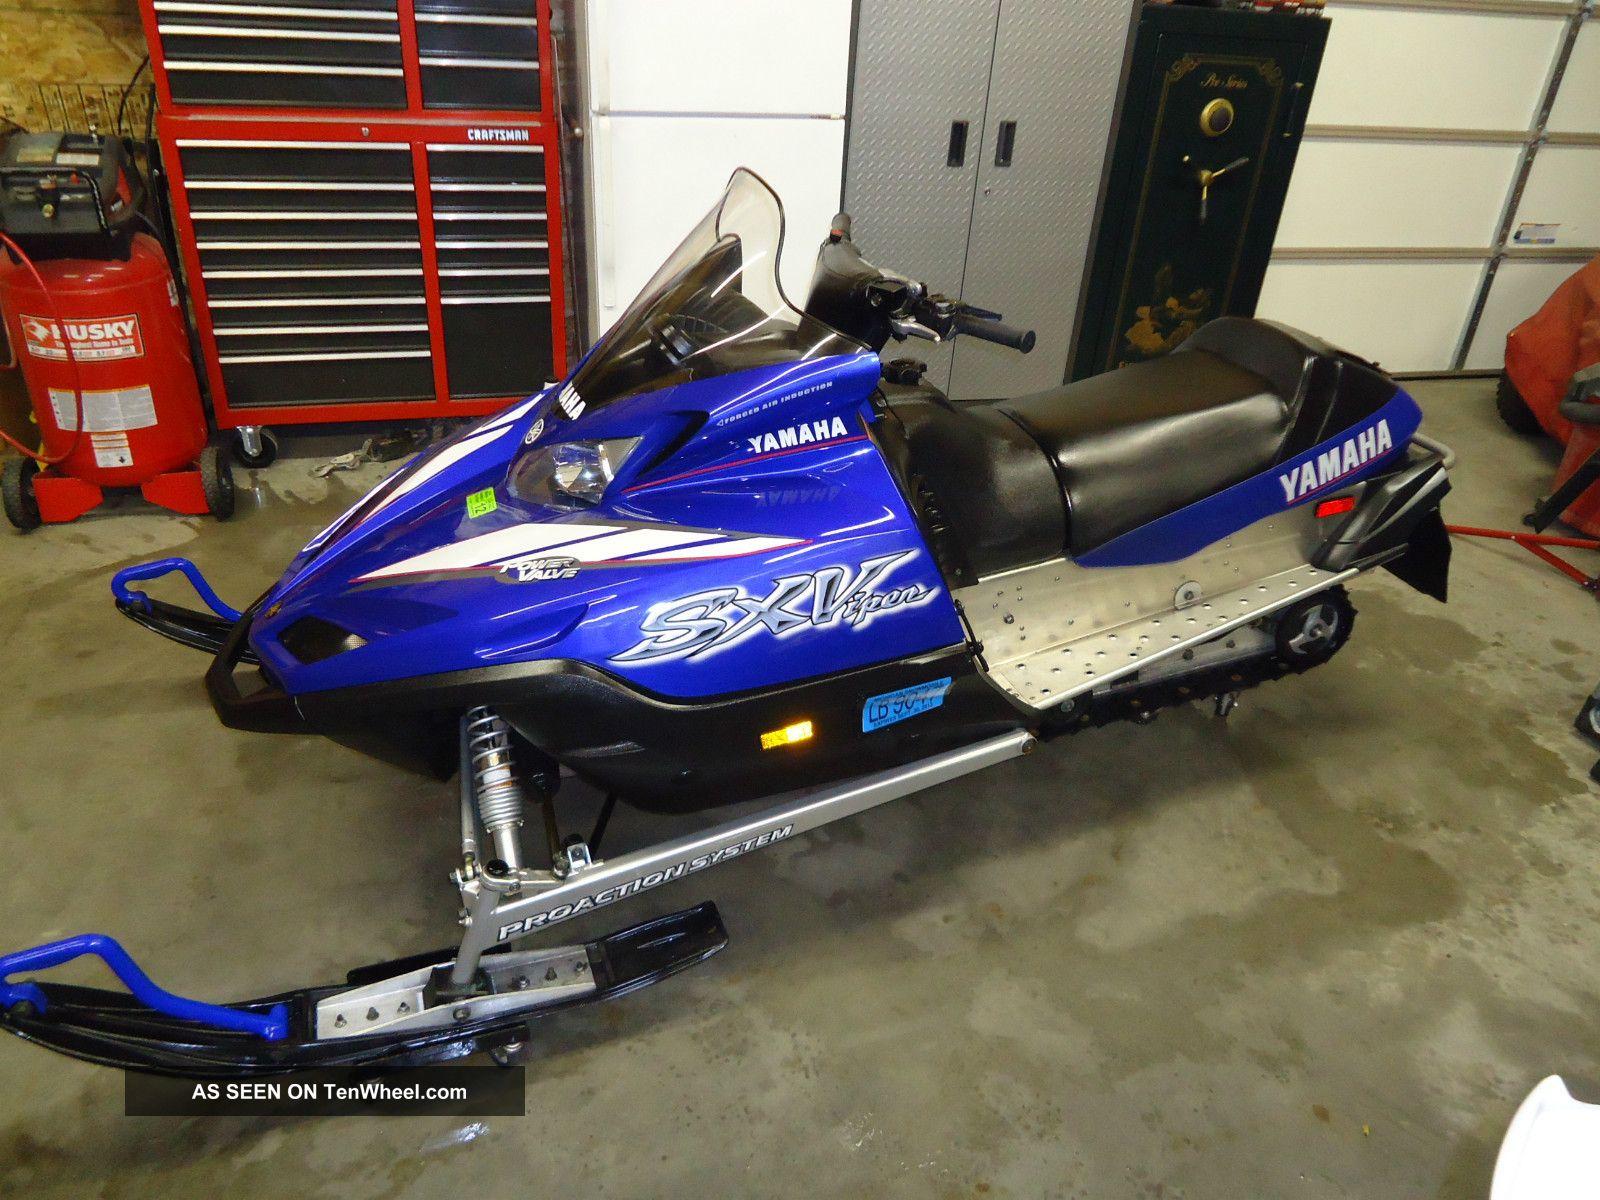 Yamaha Viper Snowmobile Specs